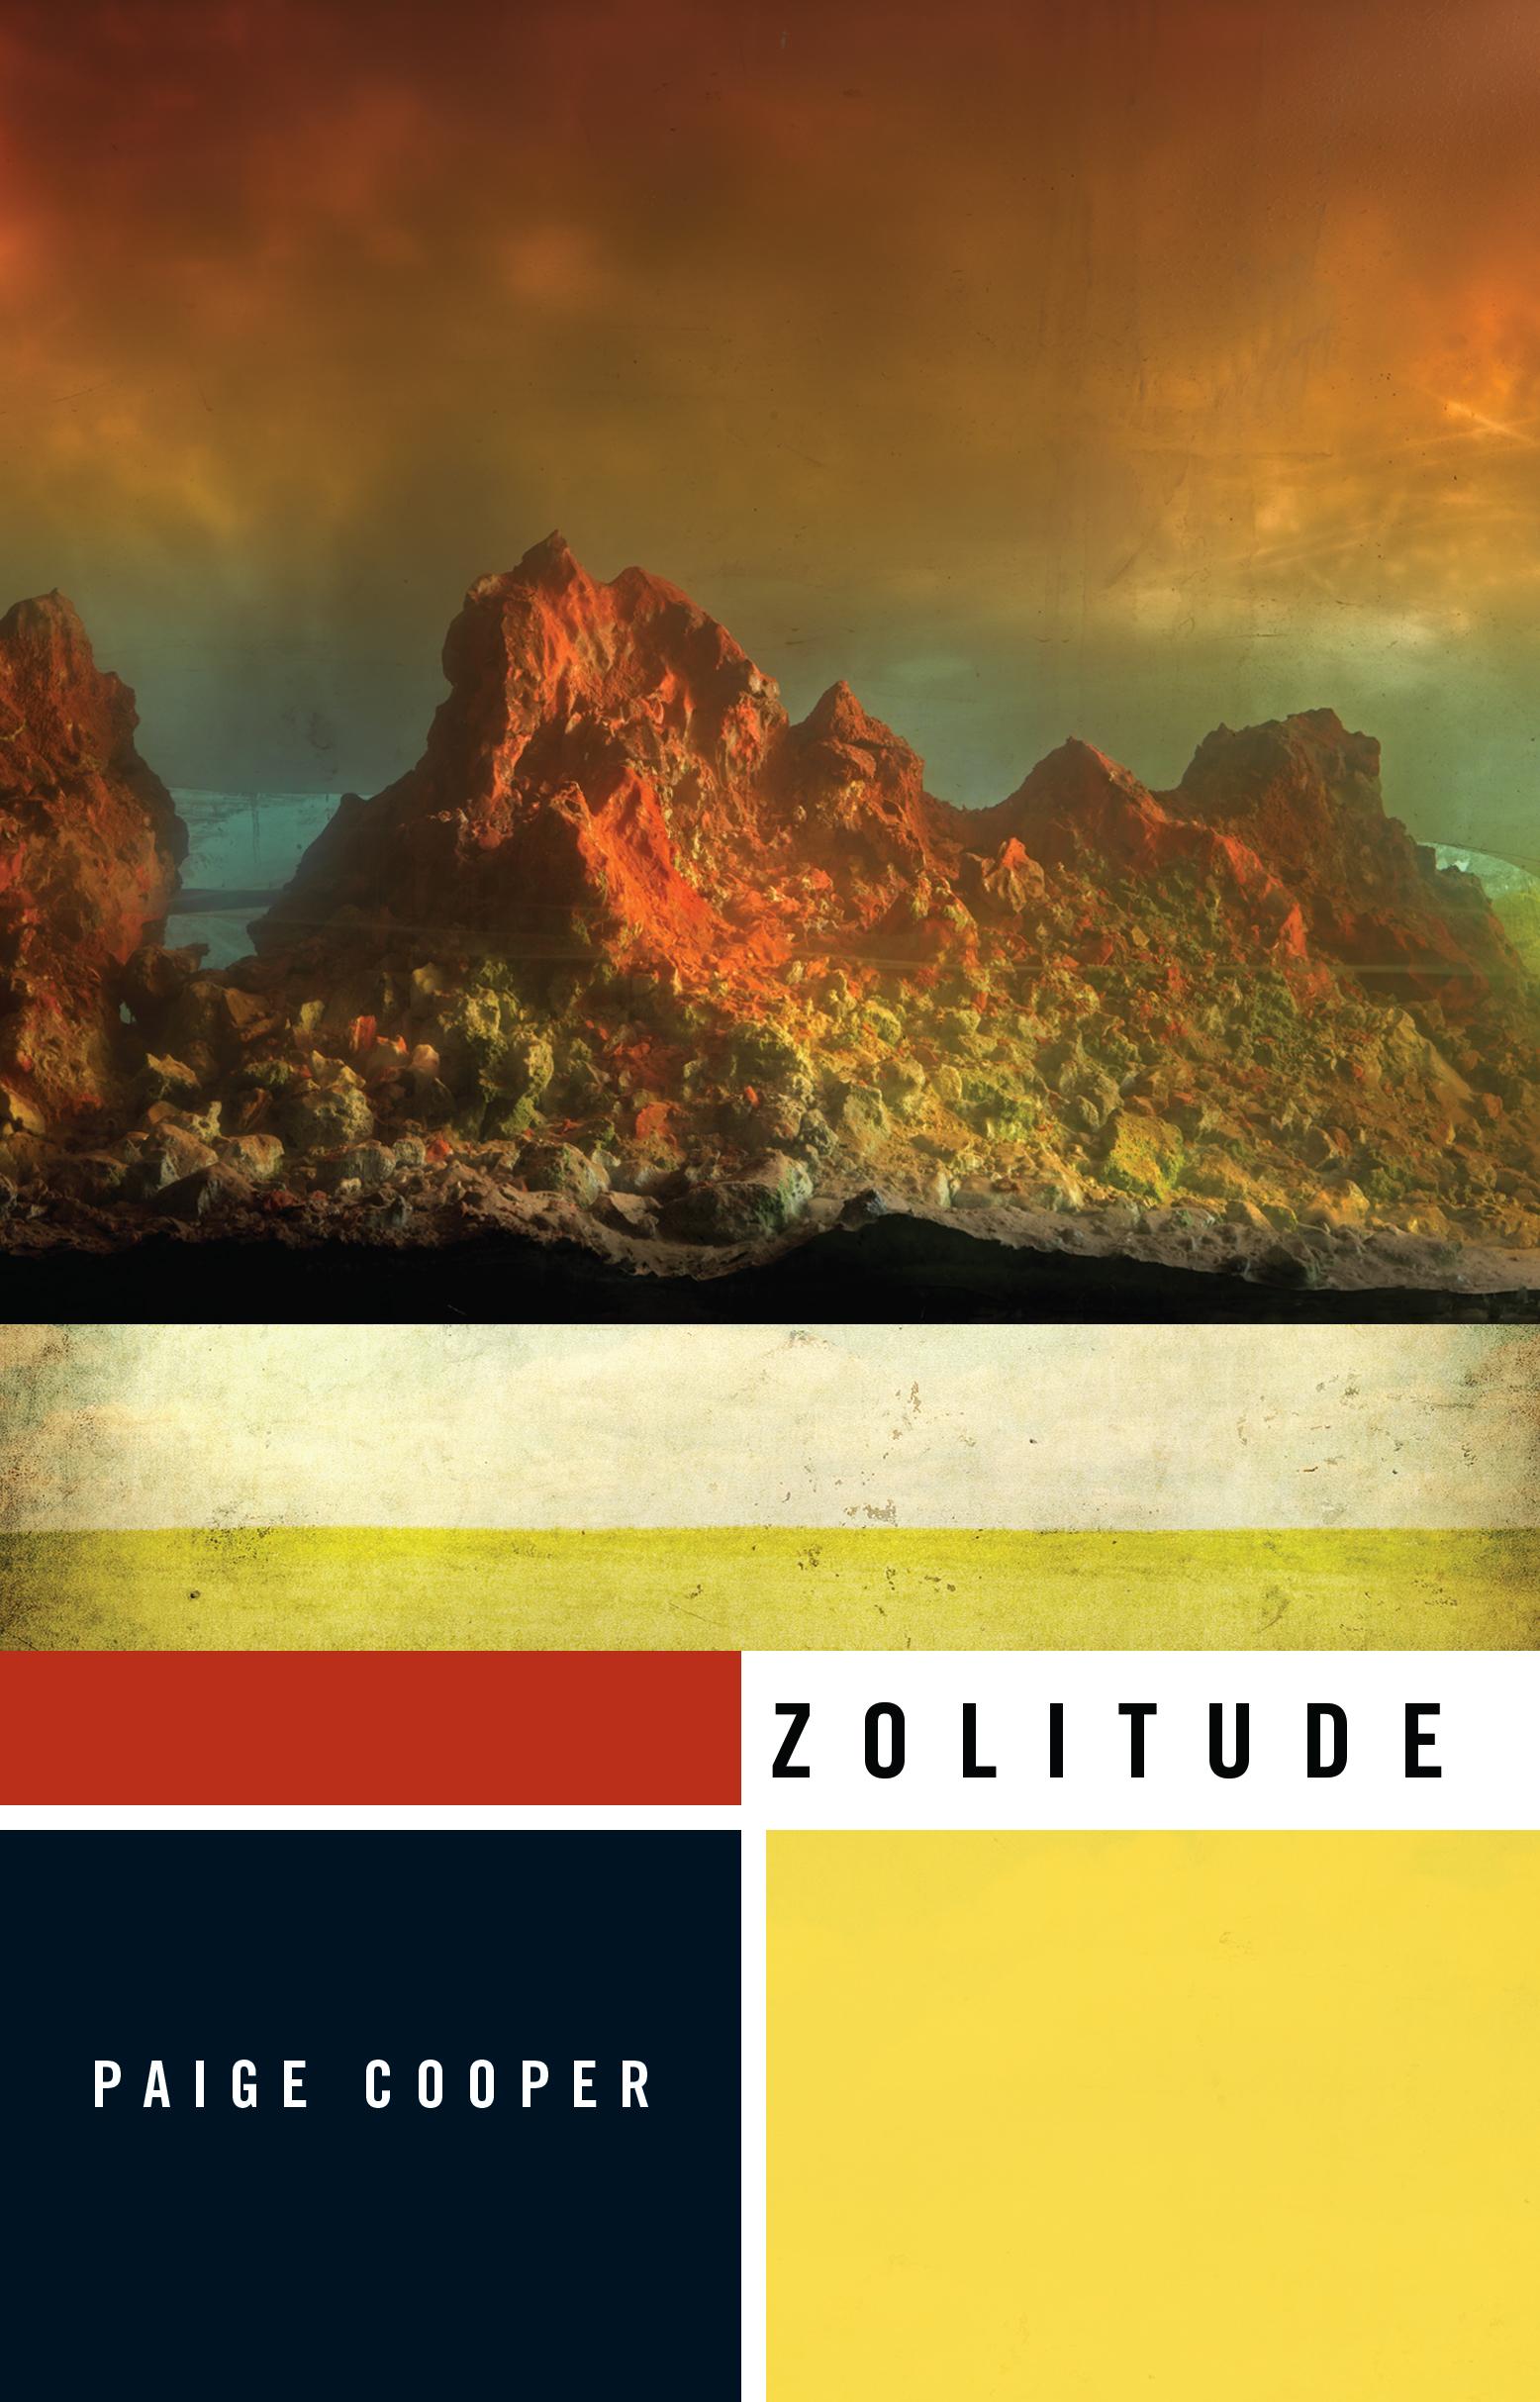 ZolitudeCover.jpg